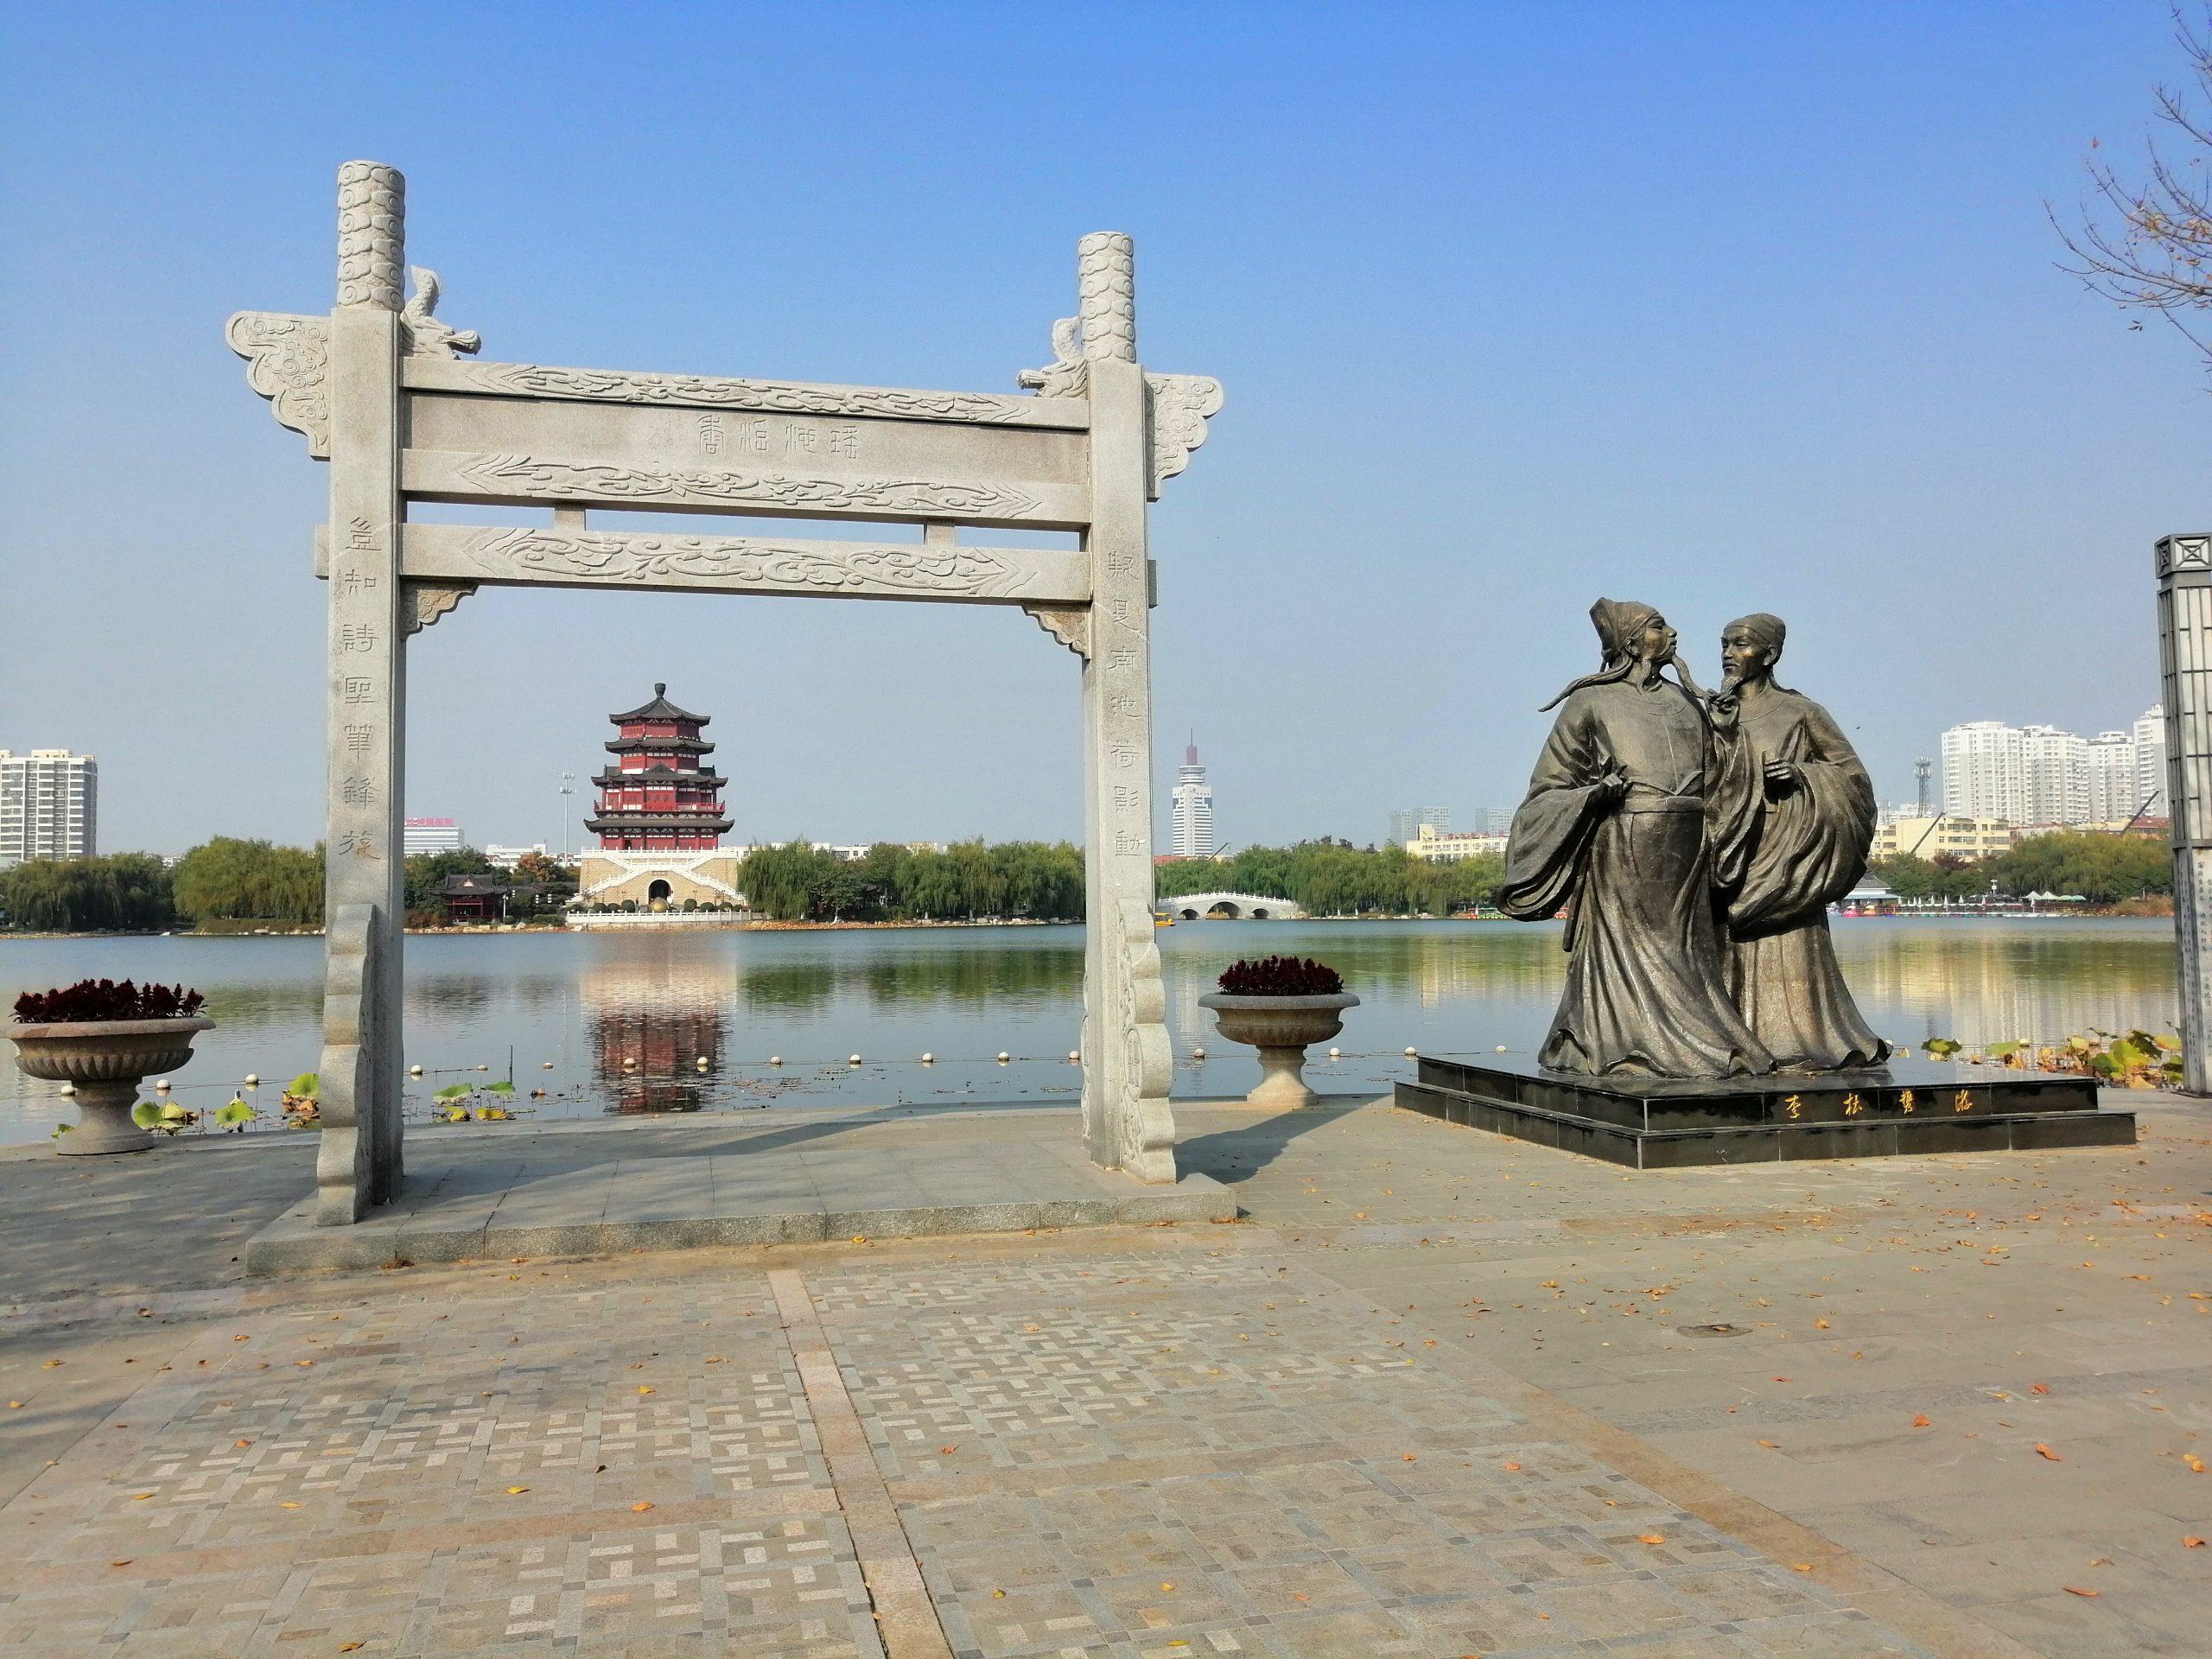 Jining shandong province